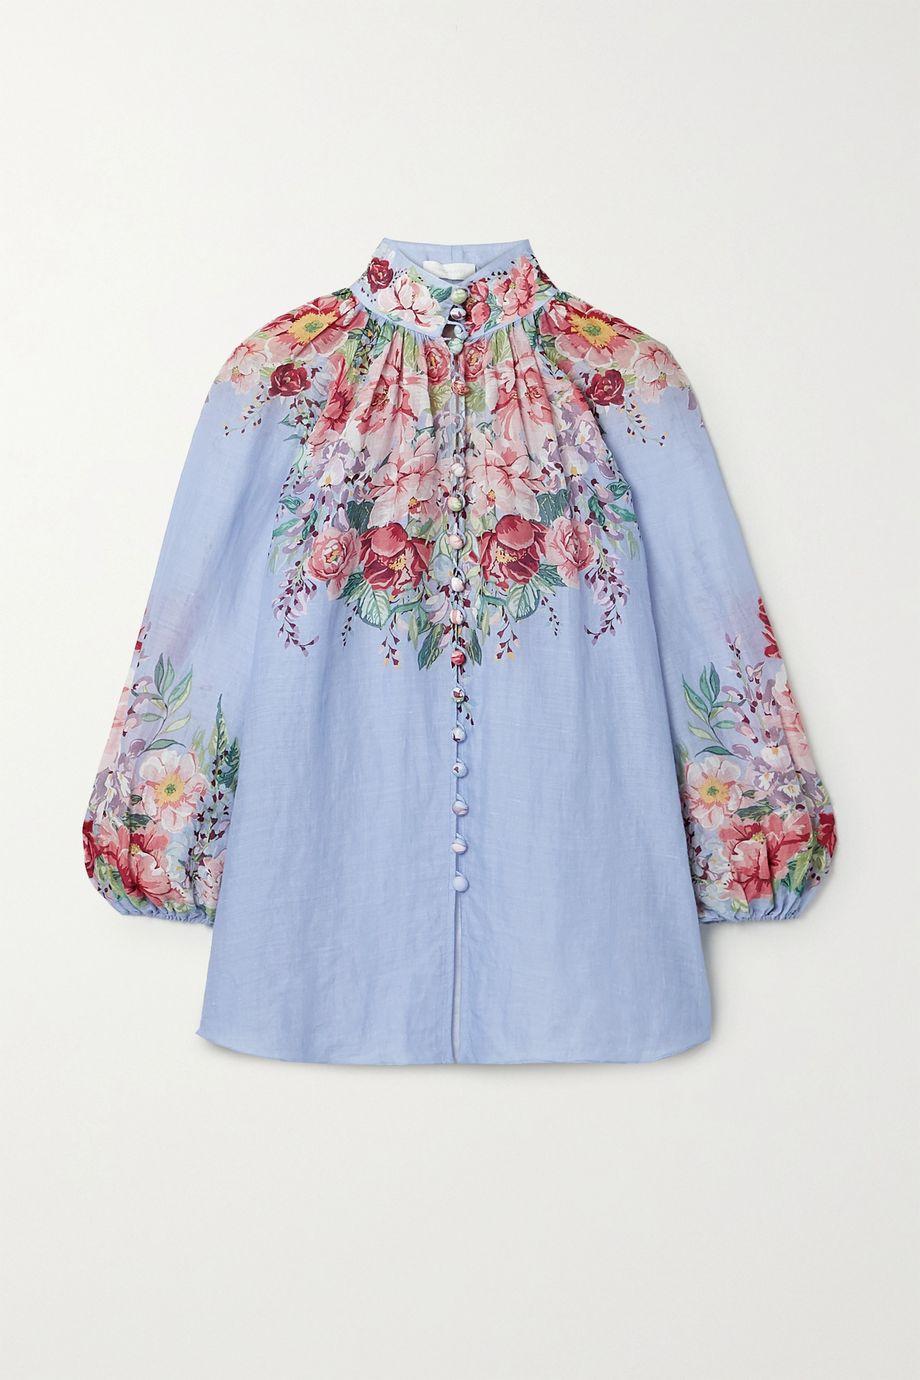 Zimmermann Bellitude floral-print ramie blouse